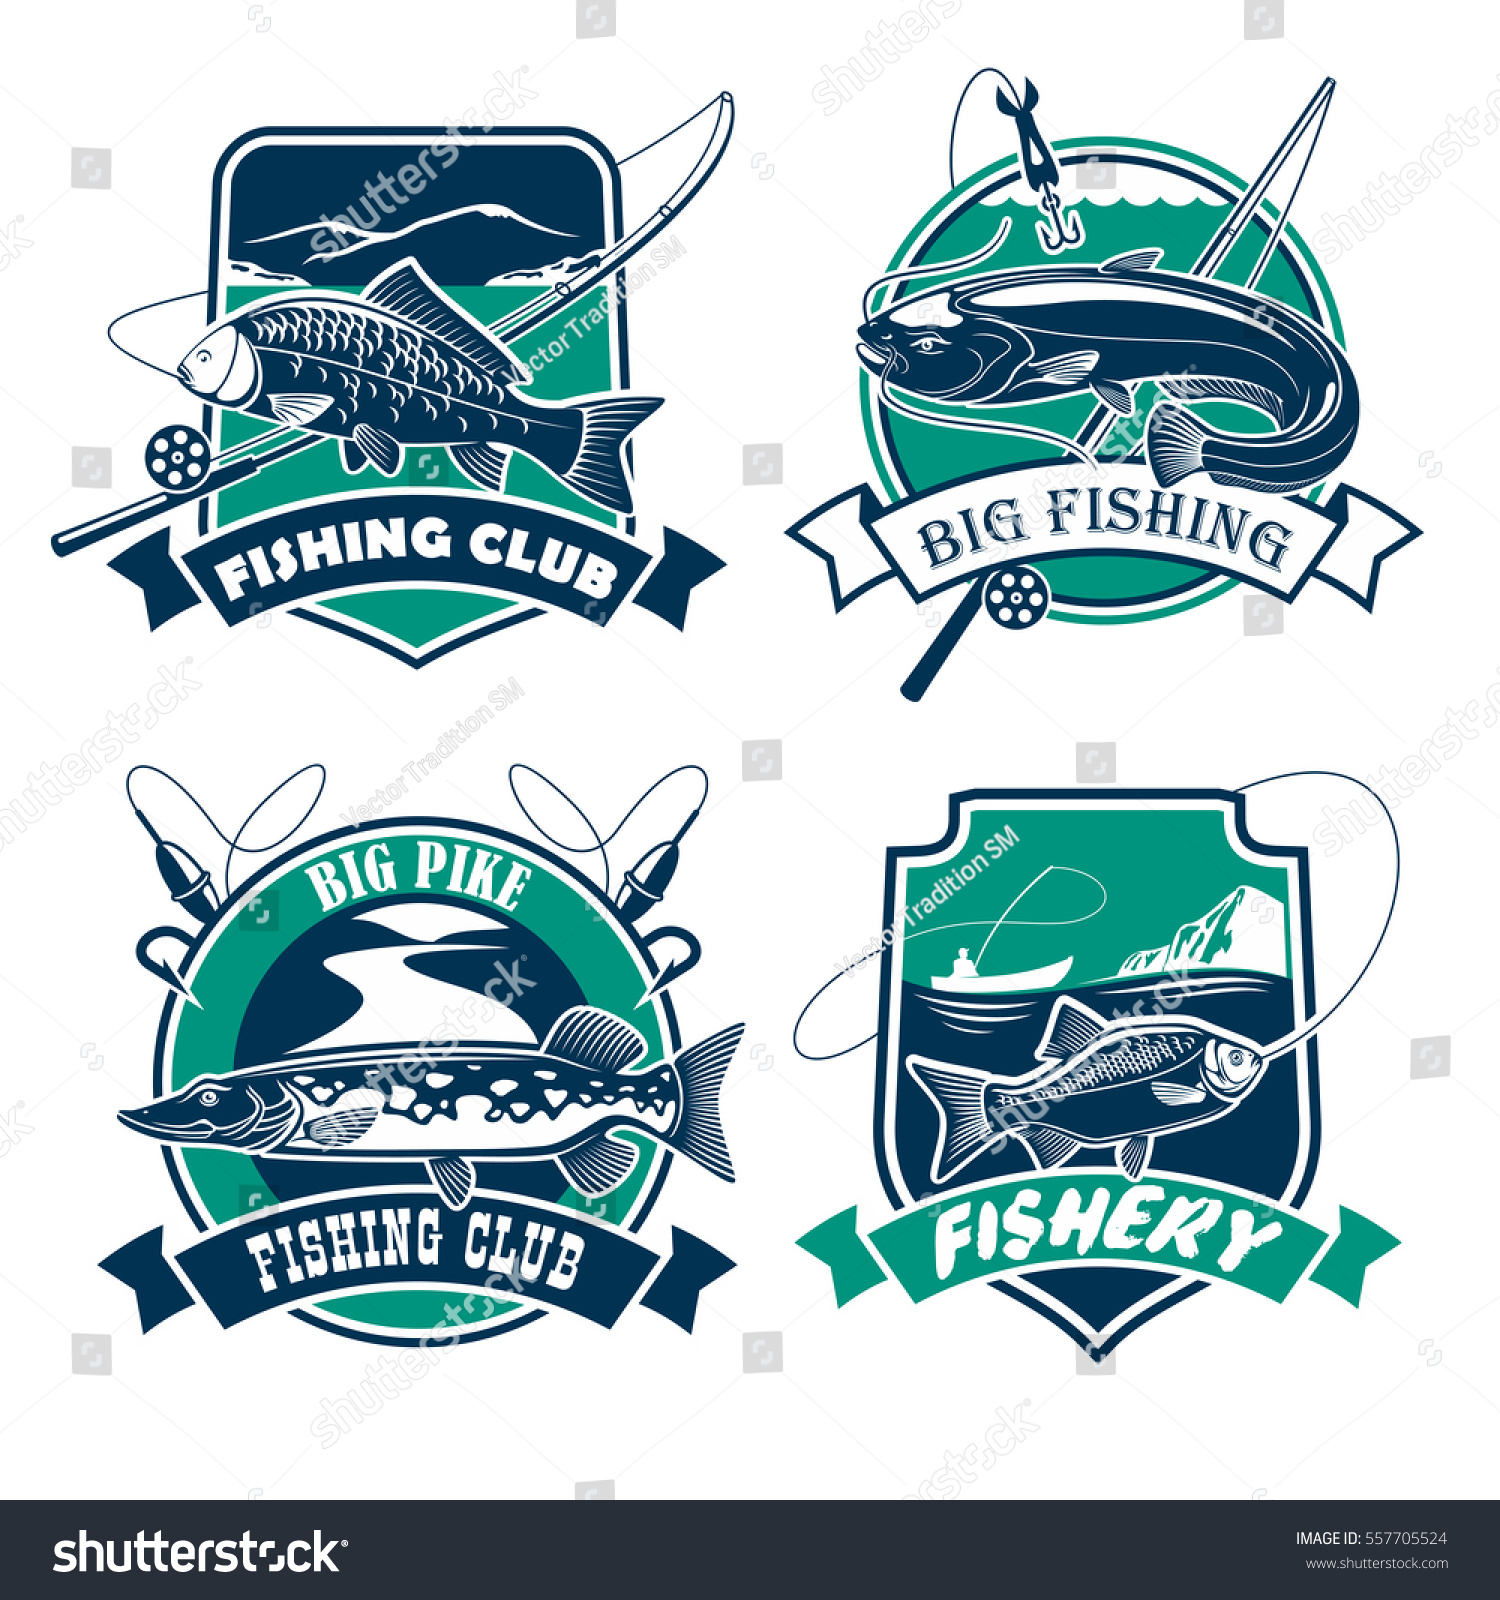 Fishing Icons Set Fisherman Club Fishery Stock Vector 557705524